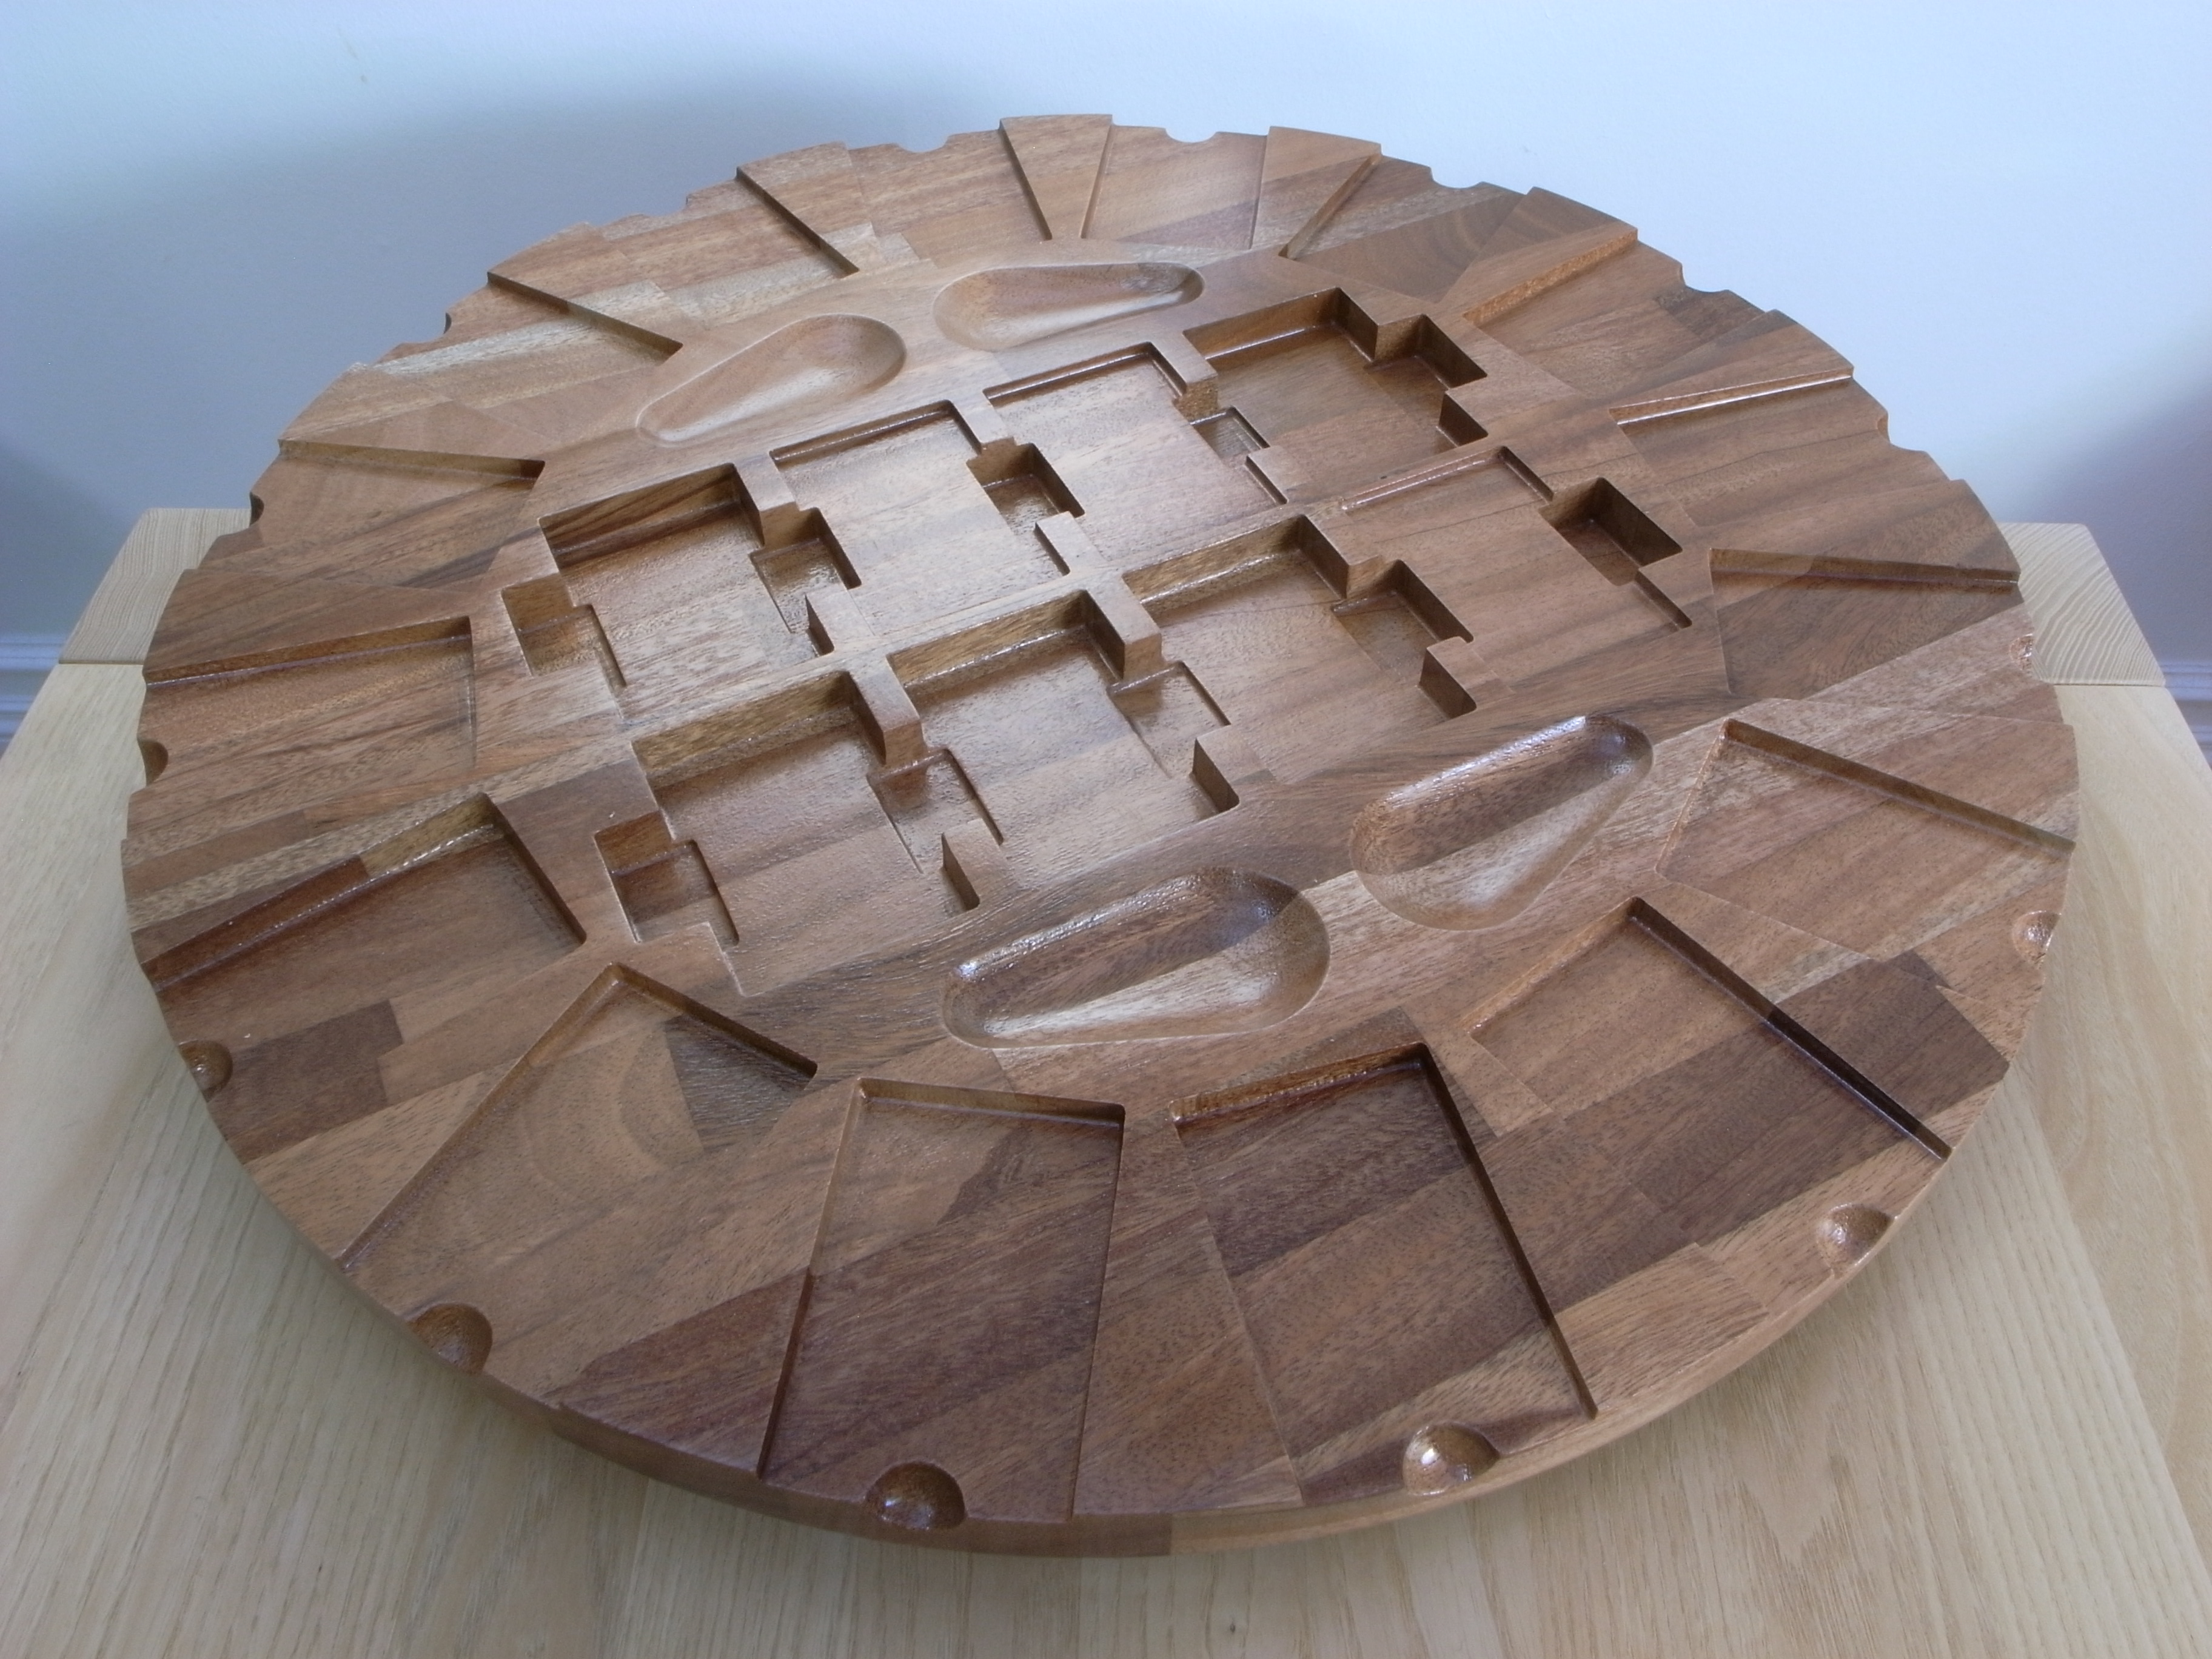 Pleasant Dominion Turntable Woodworking Blog Download Free Architecture Designs Scobabritishbridgeorg